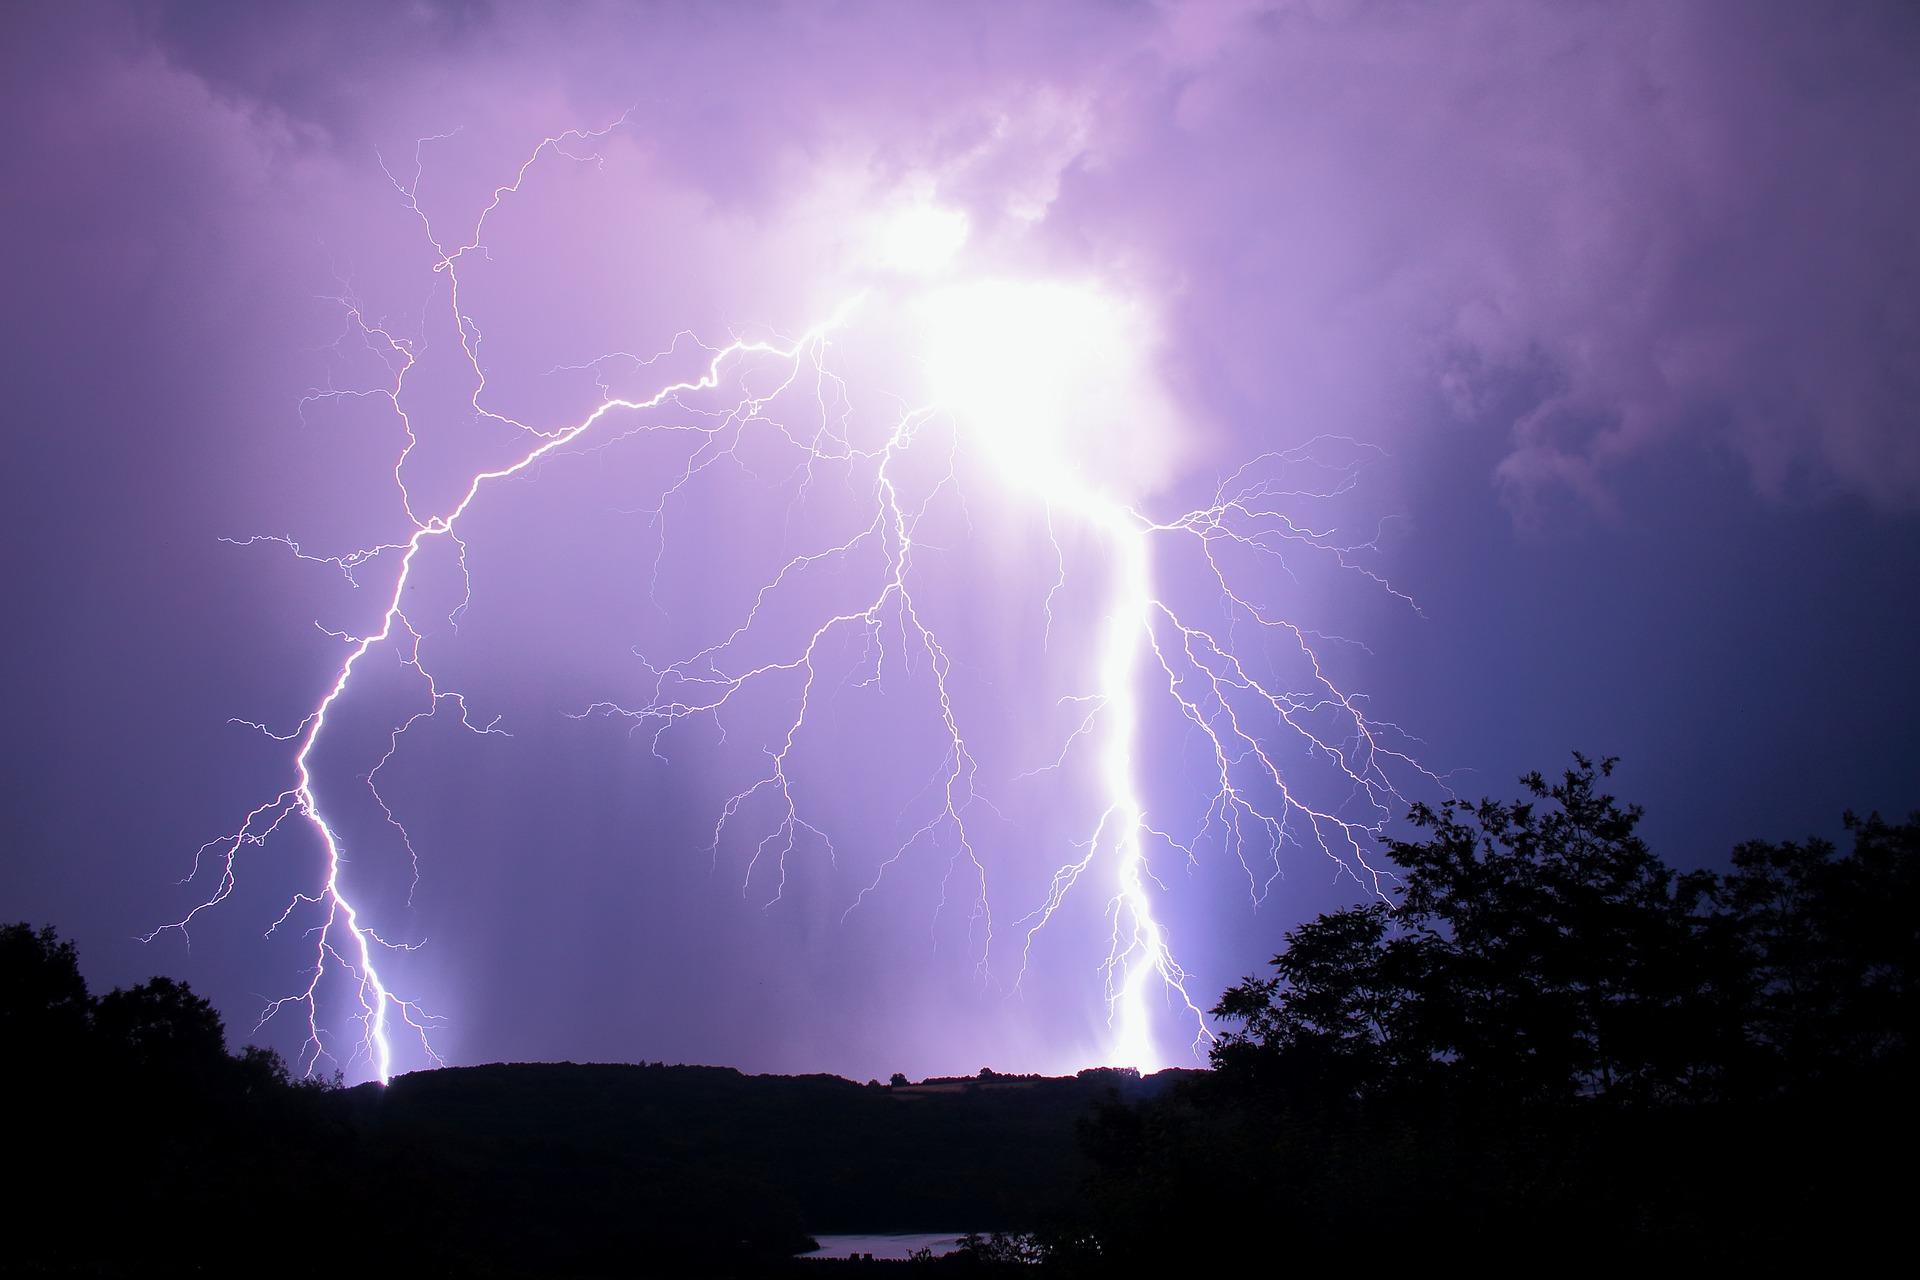 Prognoza burz na dzień 05.10.2020 i noc 05/06.10.2020